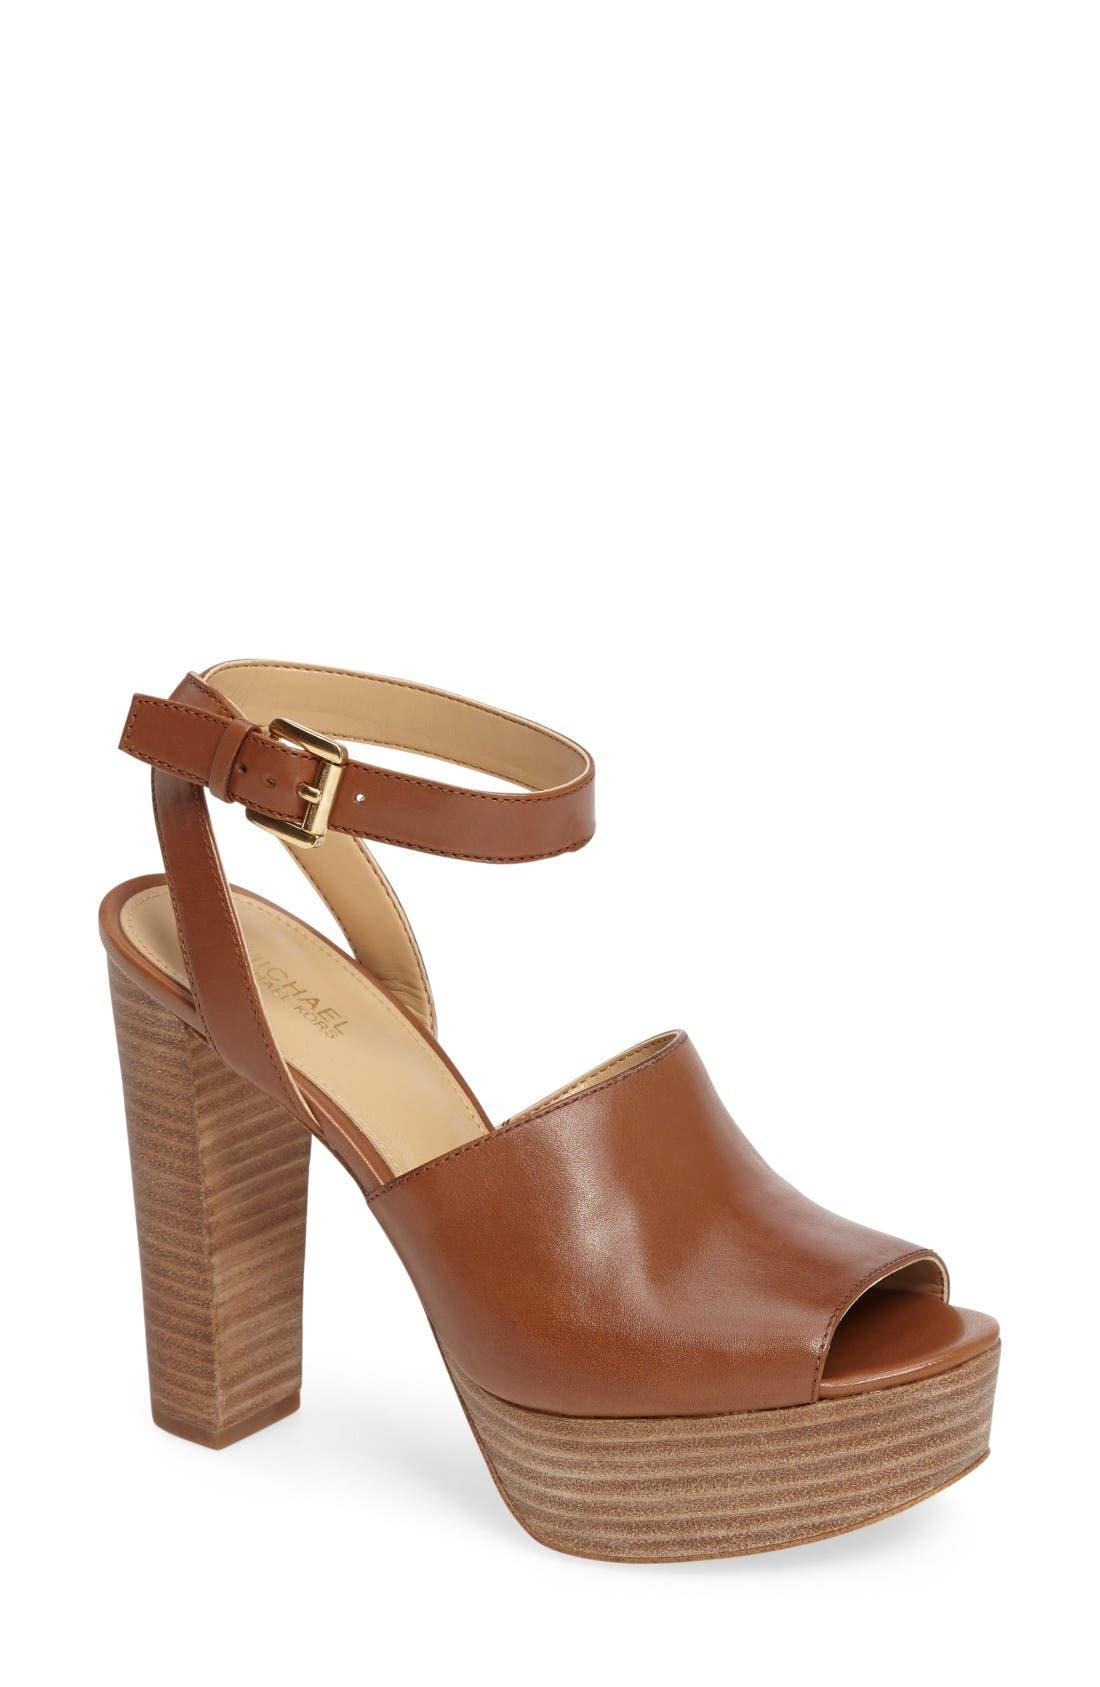 Alternate Image 1 Selected - MICHAEL Michael Kors Trina Platform Sandal (Women)